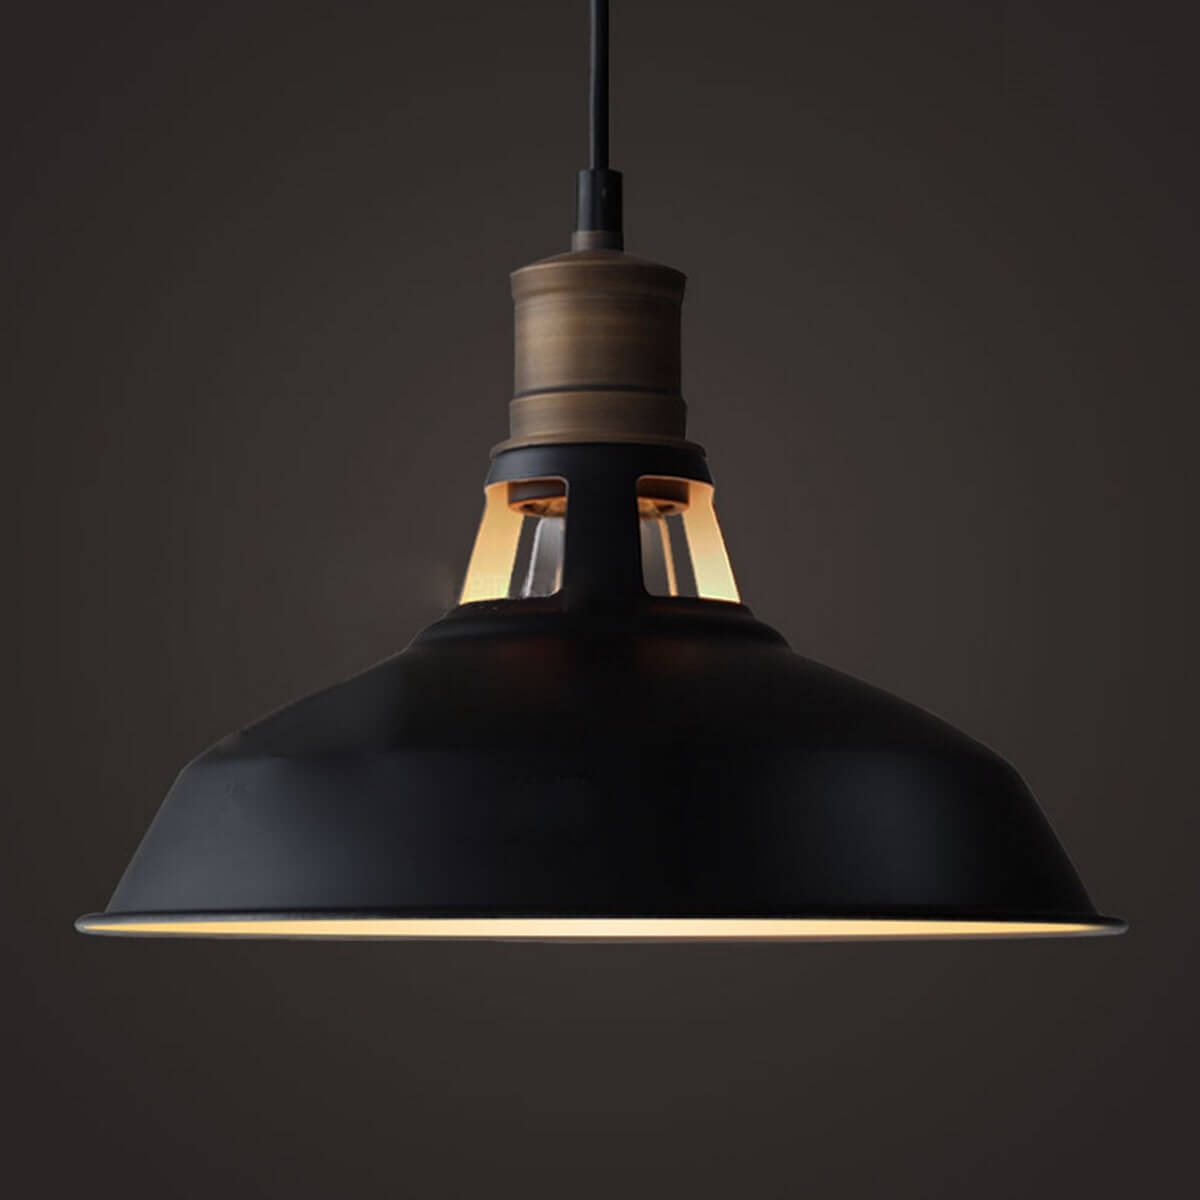 Industrial 1-Light Black Barn Pendant Lighting